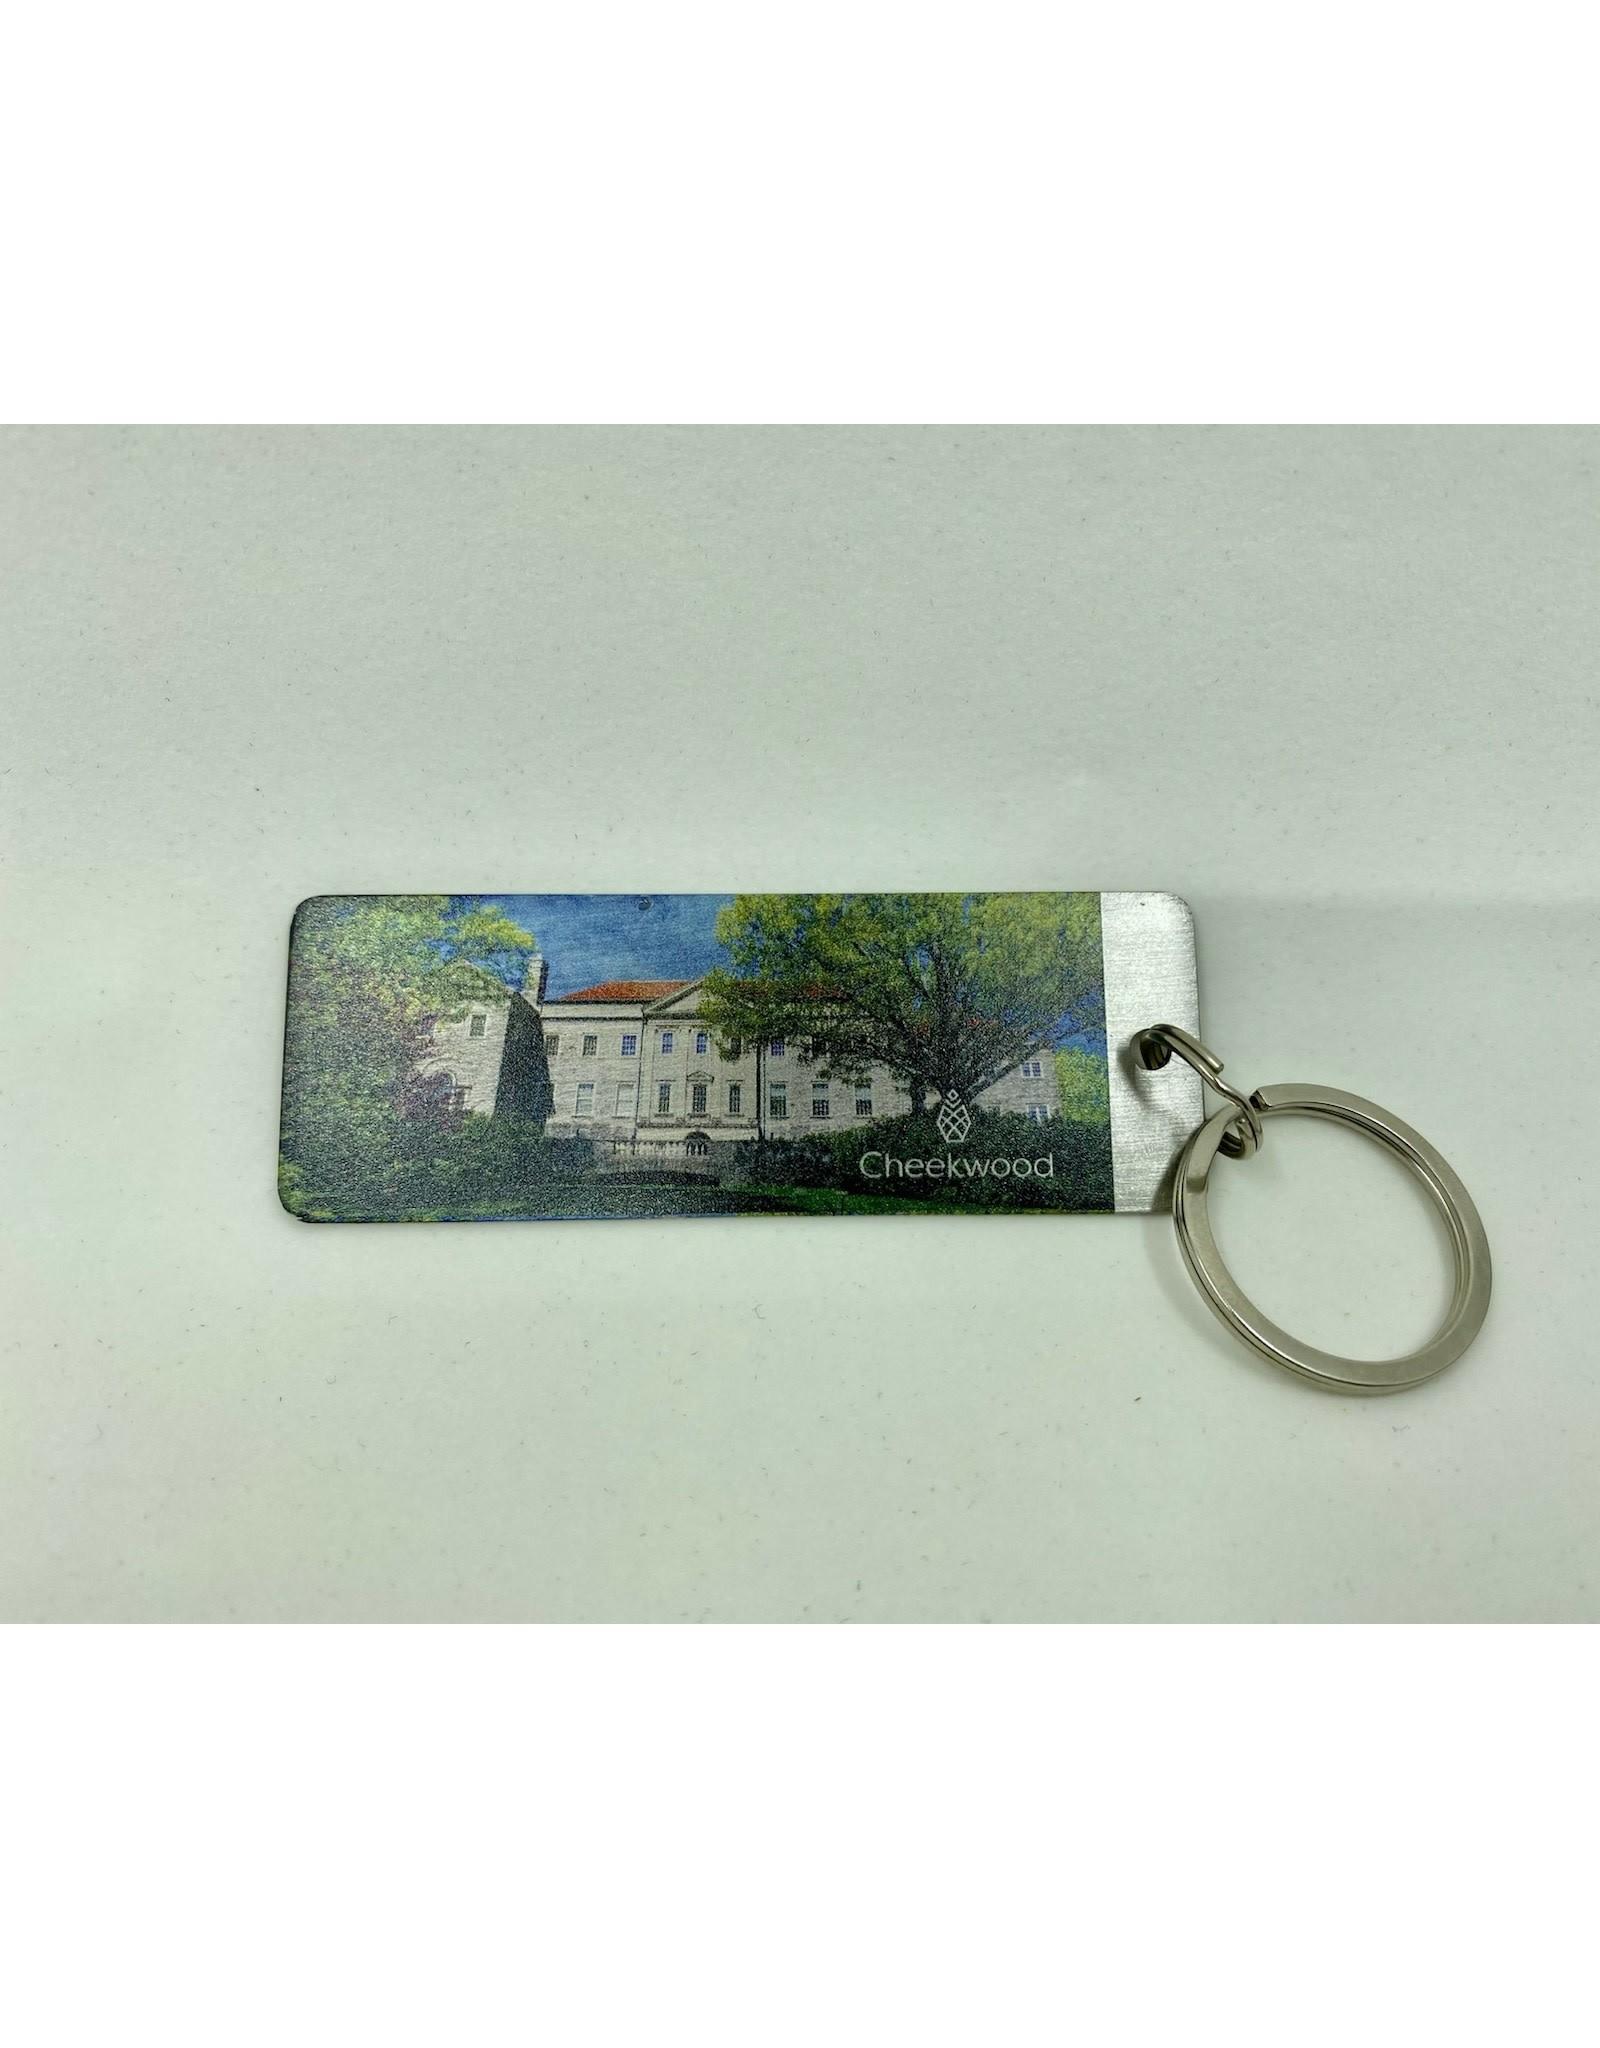 Cheekwood Mansion Keychain